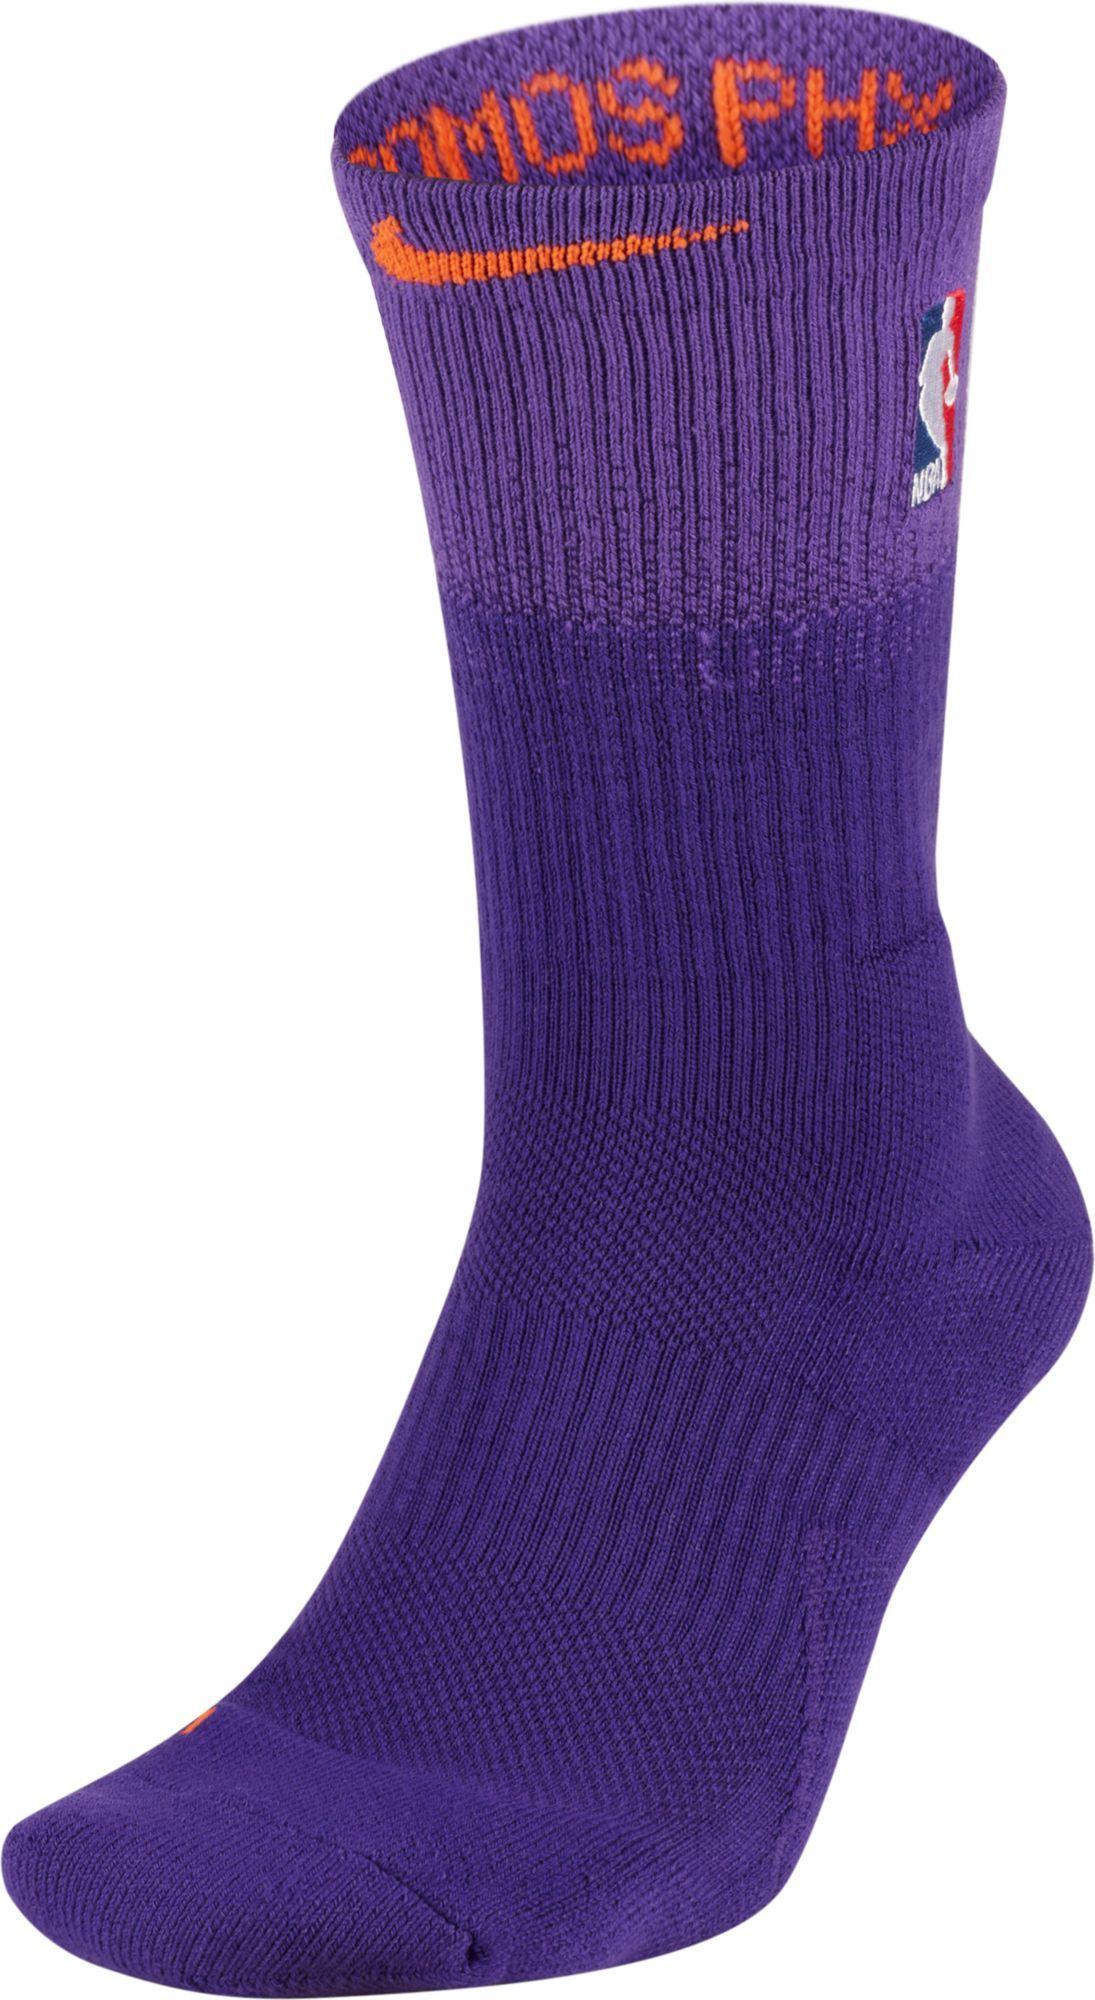 reputable site 6e244 777e7 Nike Phoenix Suns City Edition Elite Crew Socks | Products ...